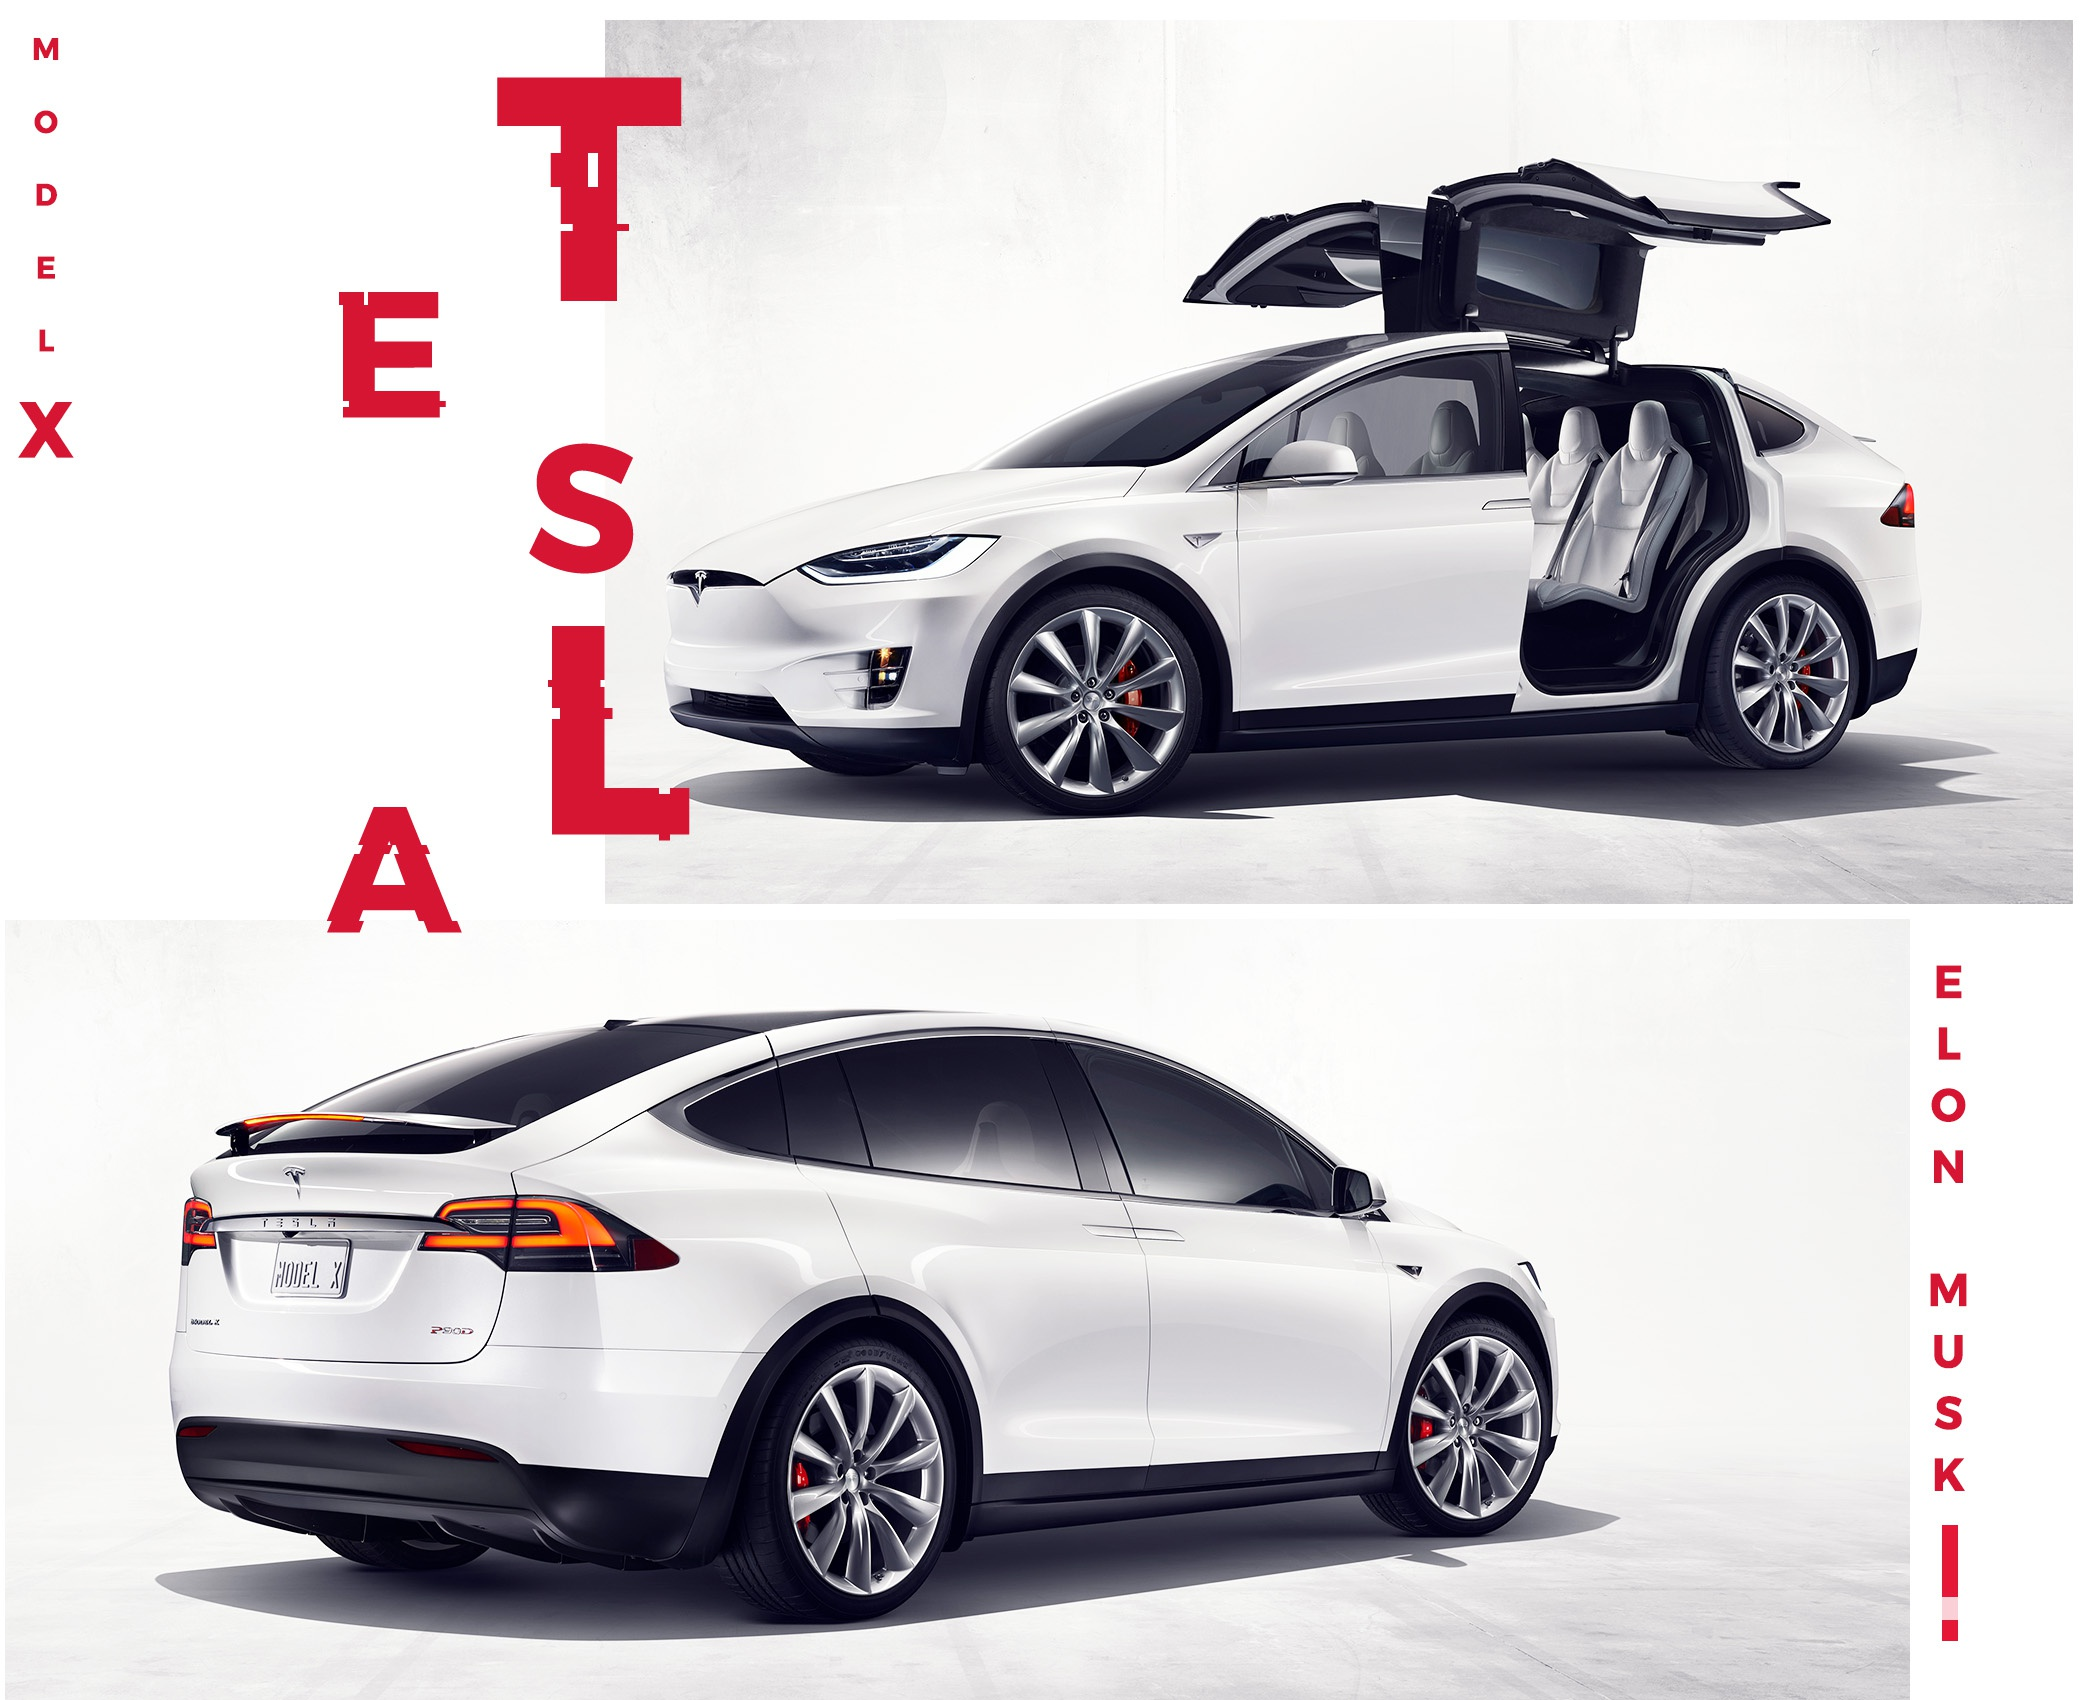 Tesla - hang xe dien thay doi lich su nganh xe hoi toan cau hinh anh 5